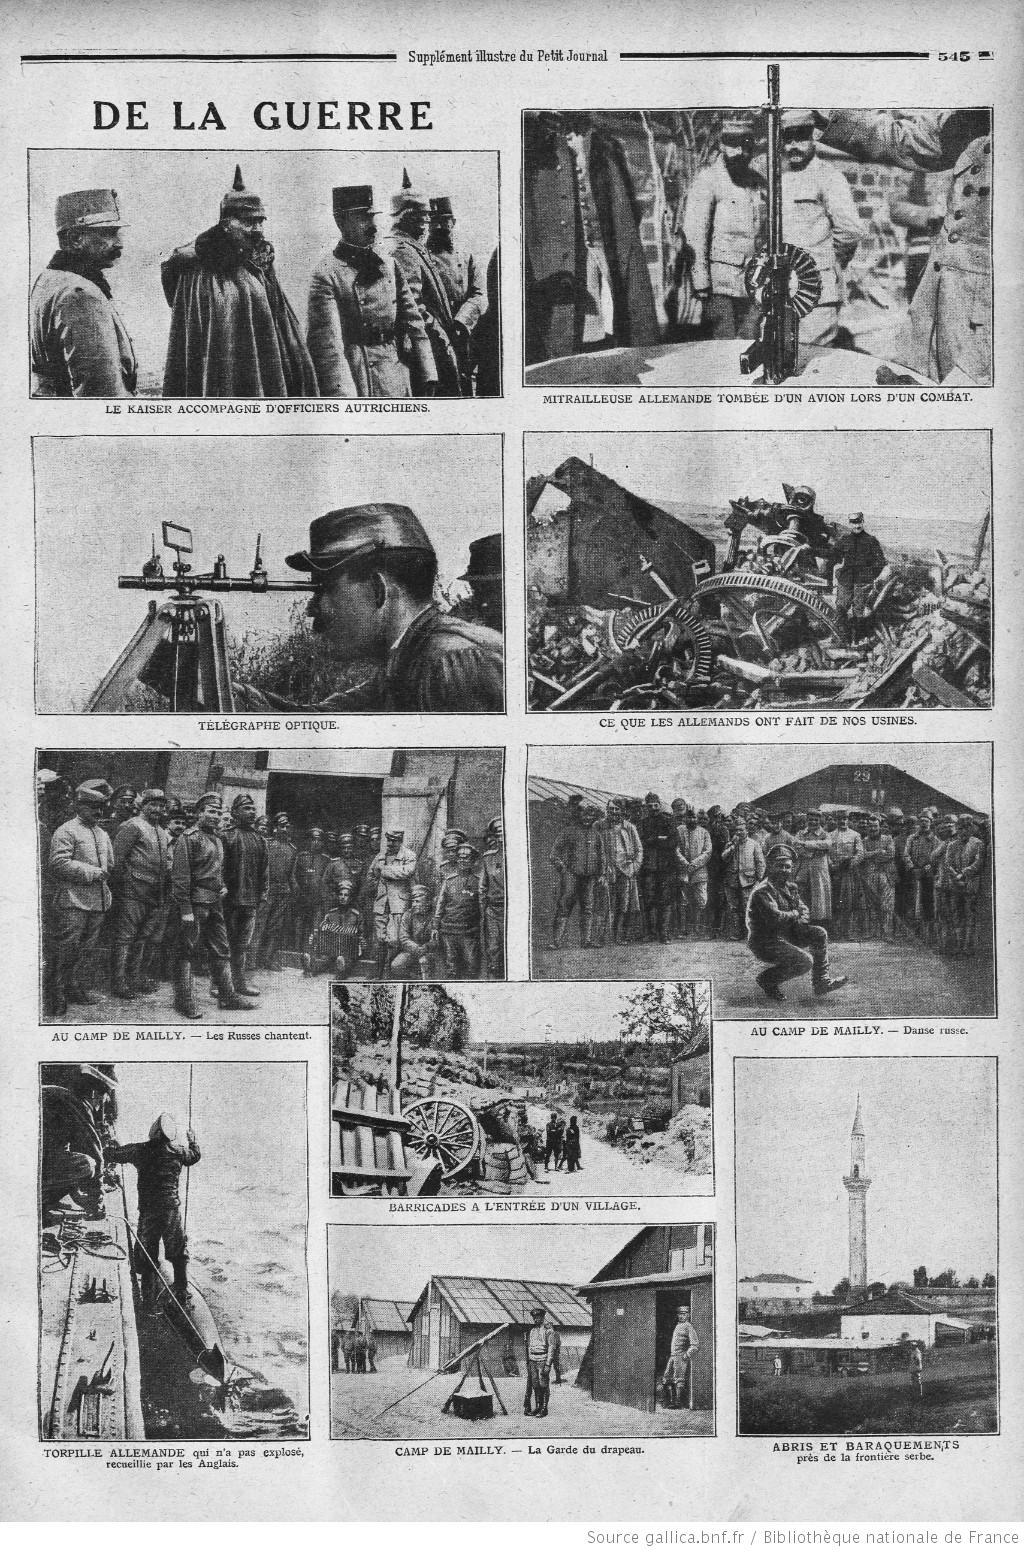 LPJ Illustre 1916-06-18 D.jpg